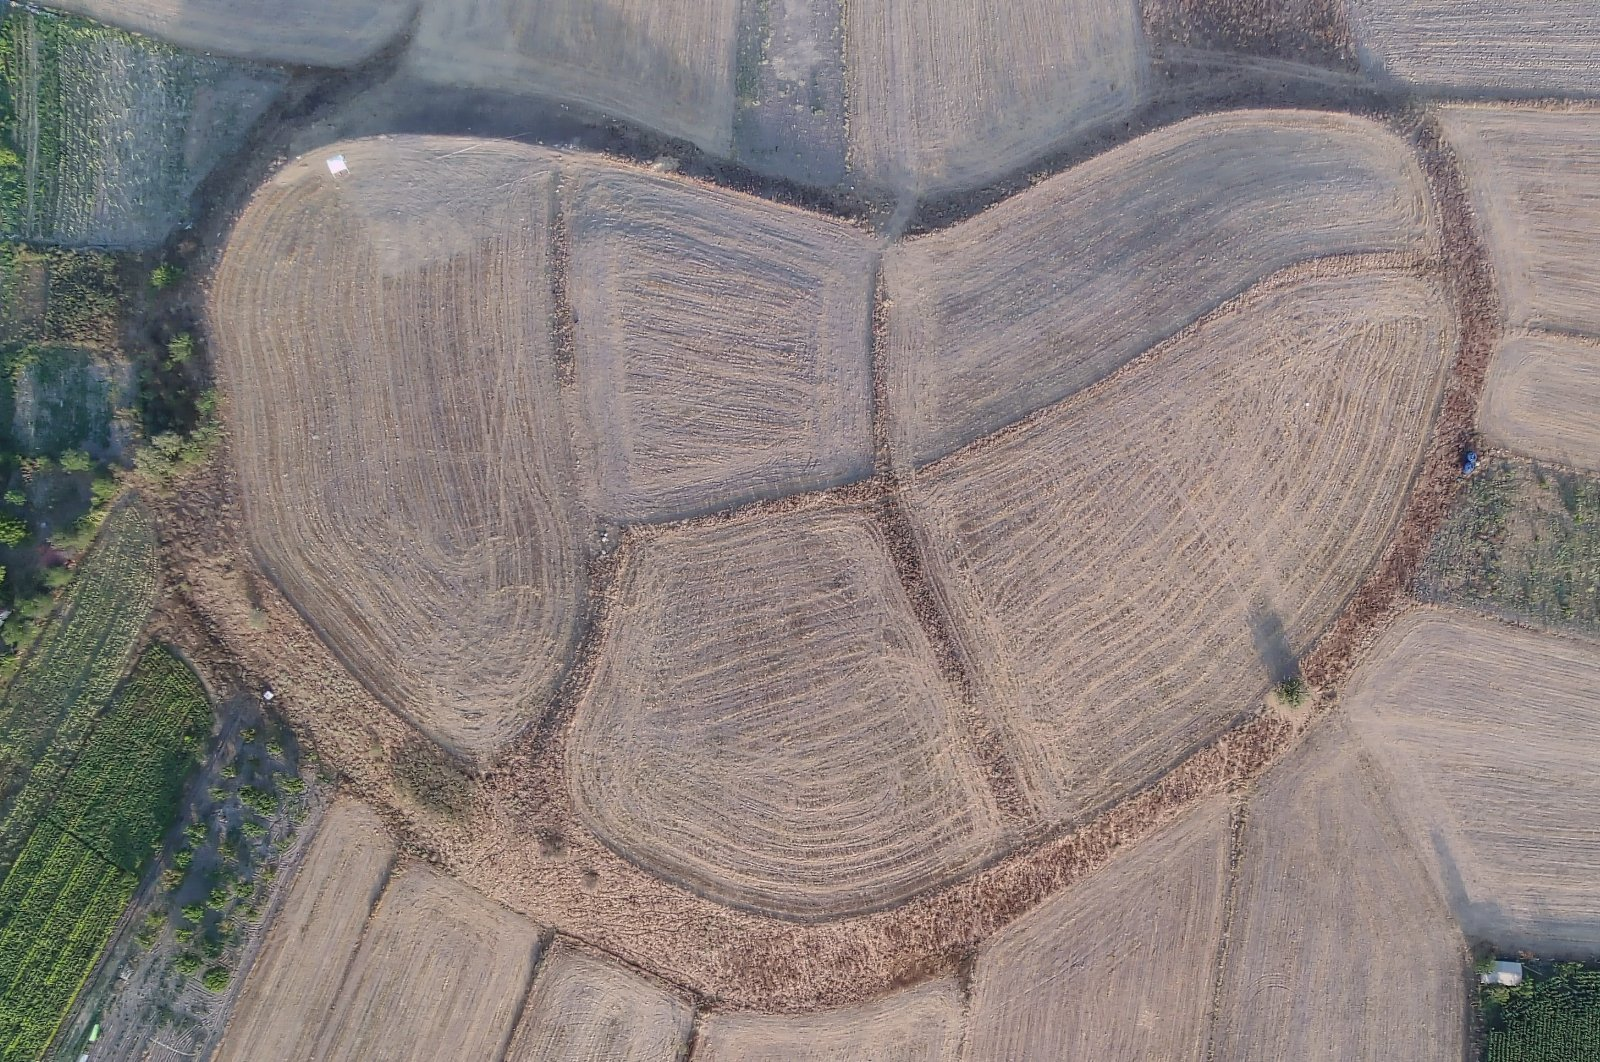 An aerial view of the Tavşanlı Mound, Kütahya, central Turkey, Aug. 28, 2021. (AA Photo)